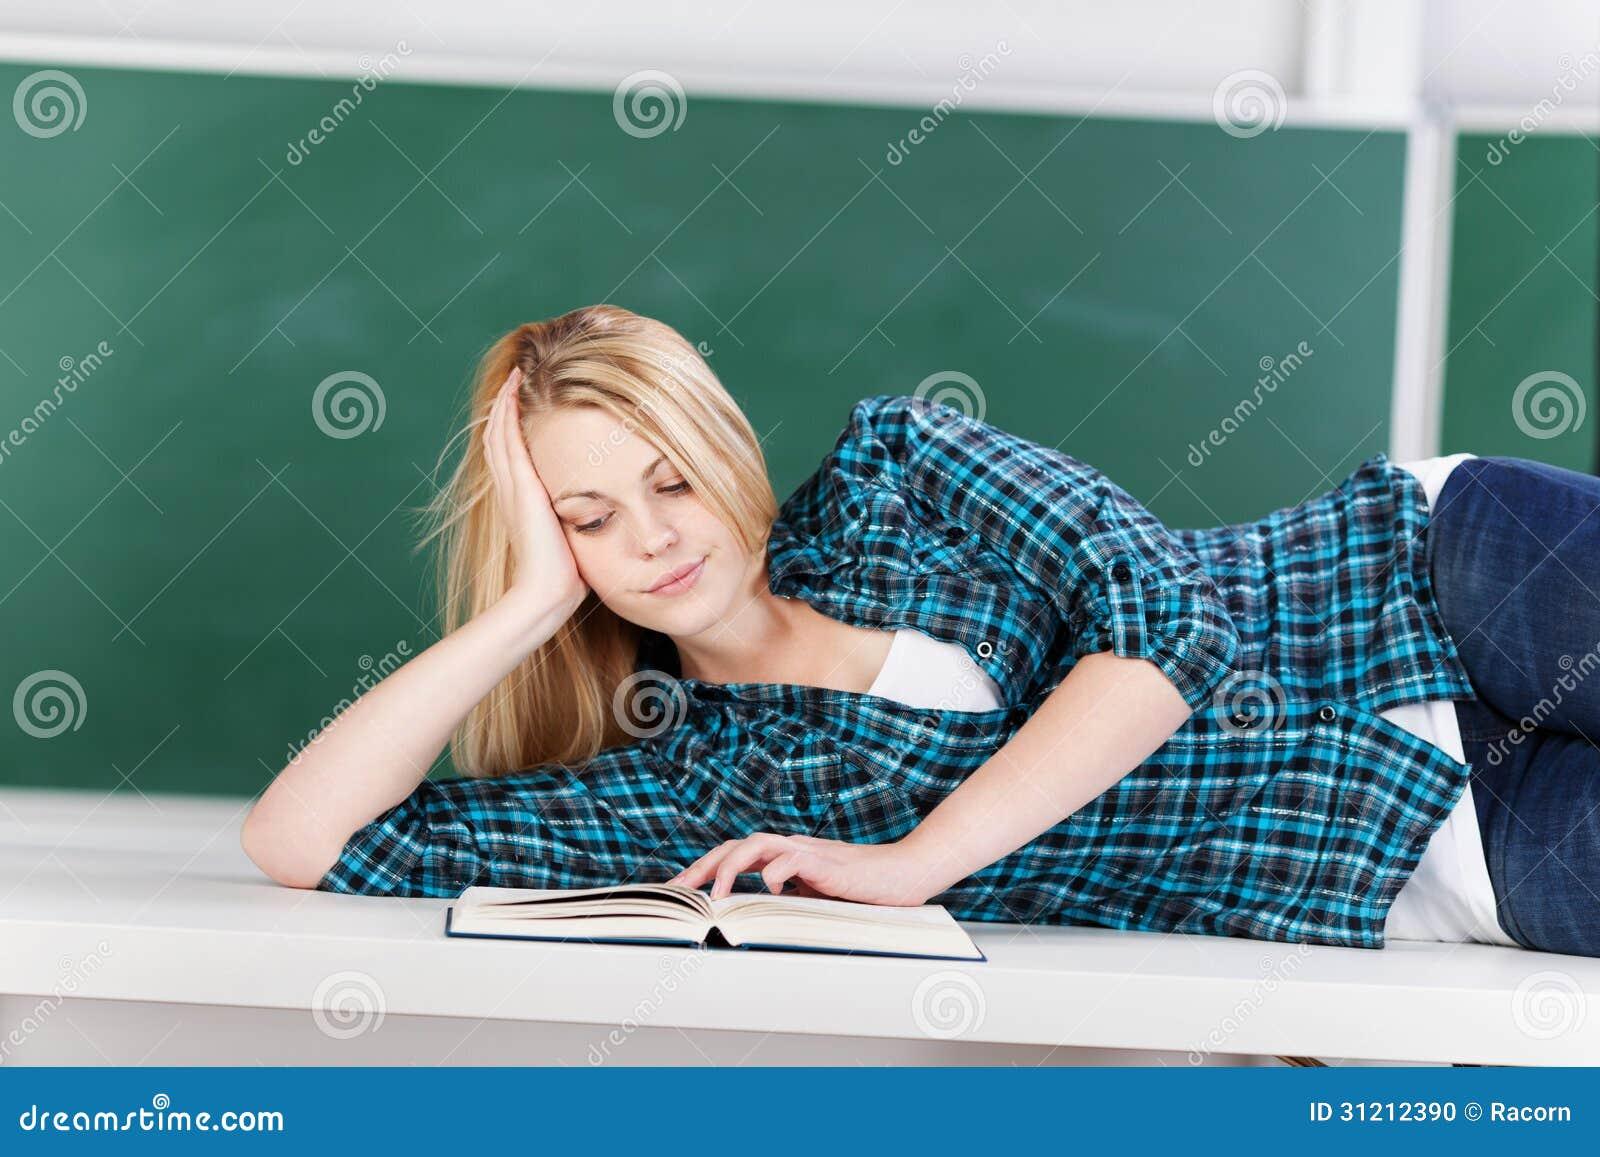 Blonde Studentin